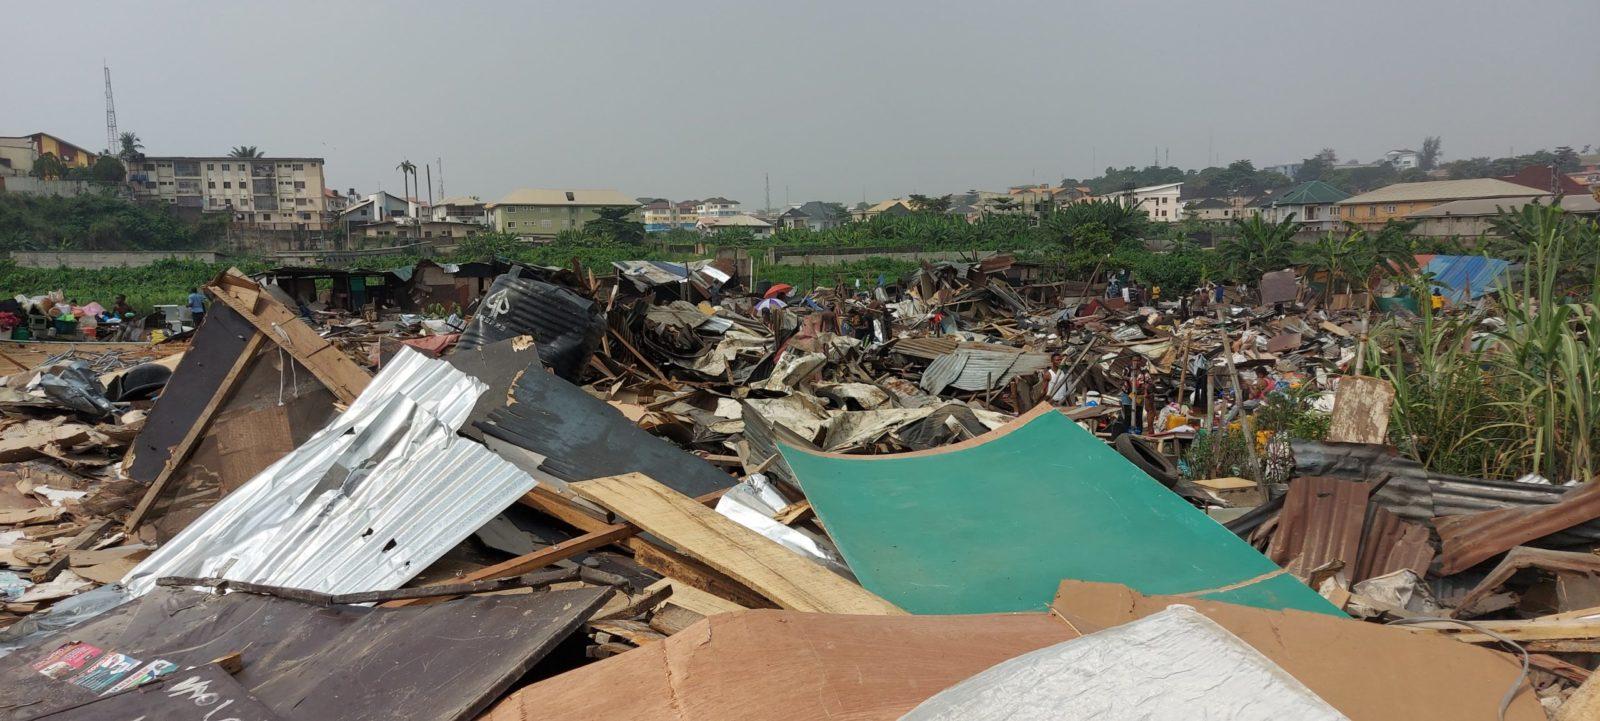 Ruins of Monkey Village, Opebi after demolition.